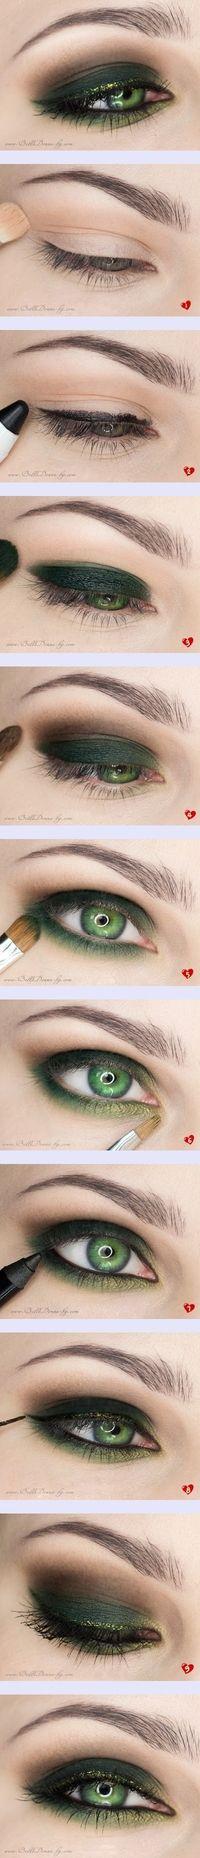 paso a paso maquillaje verde oscuro